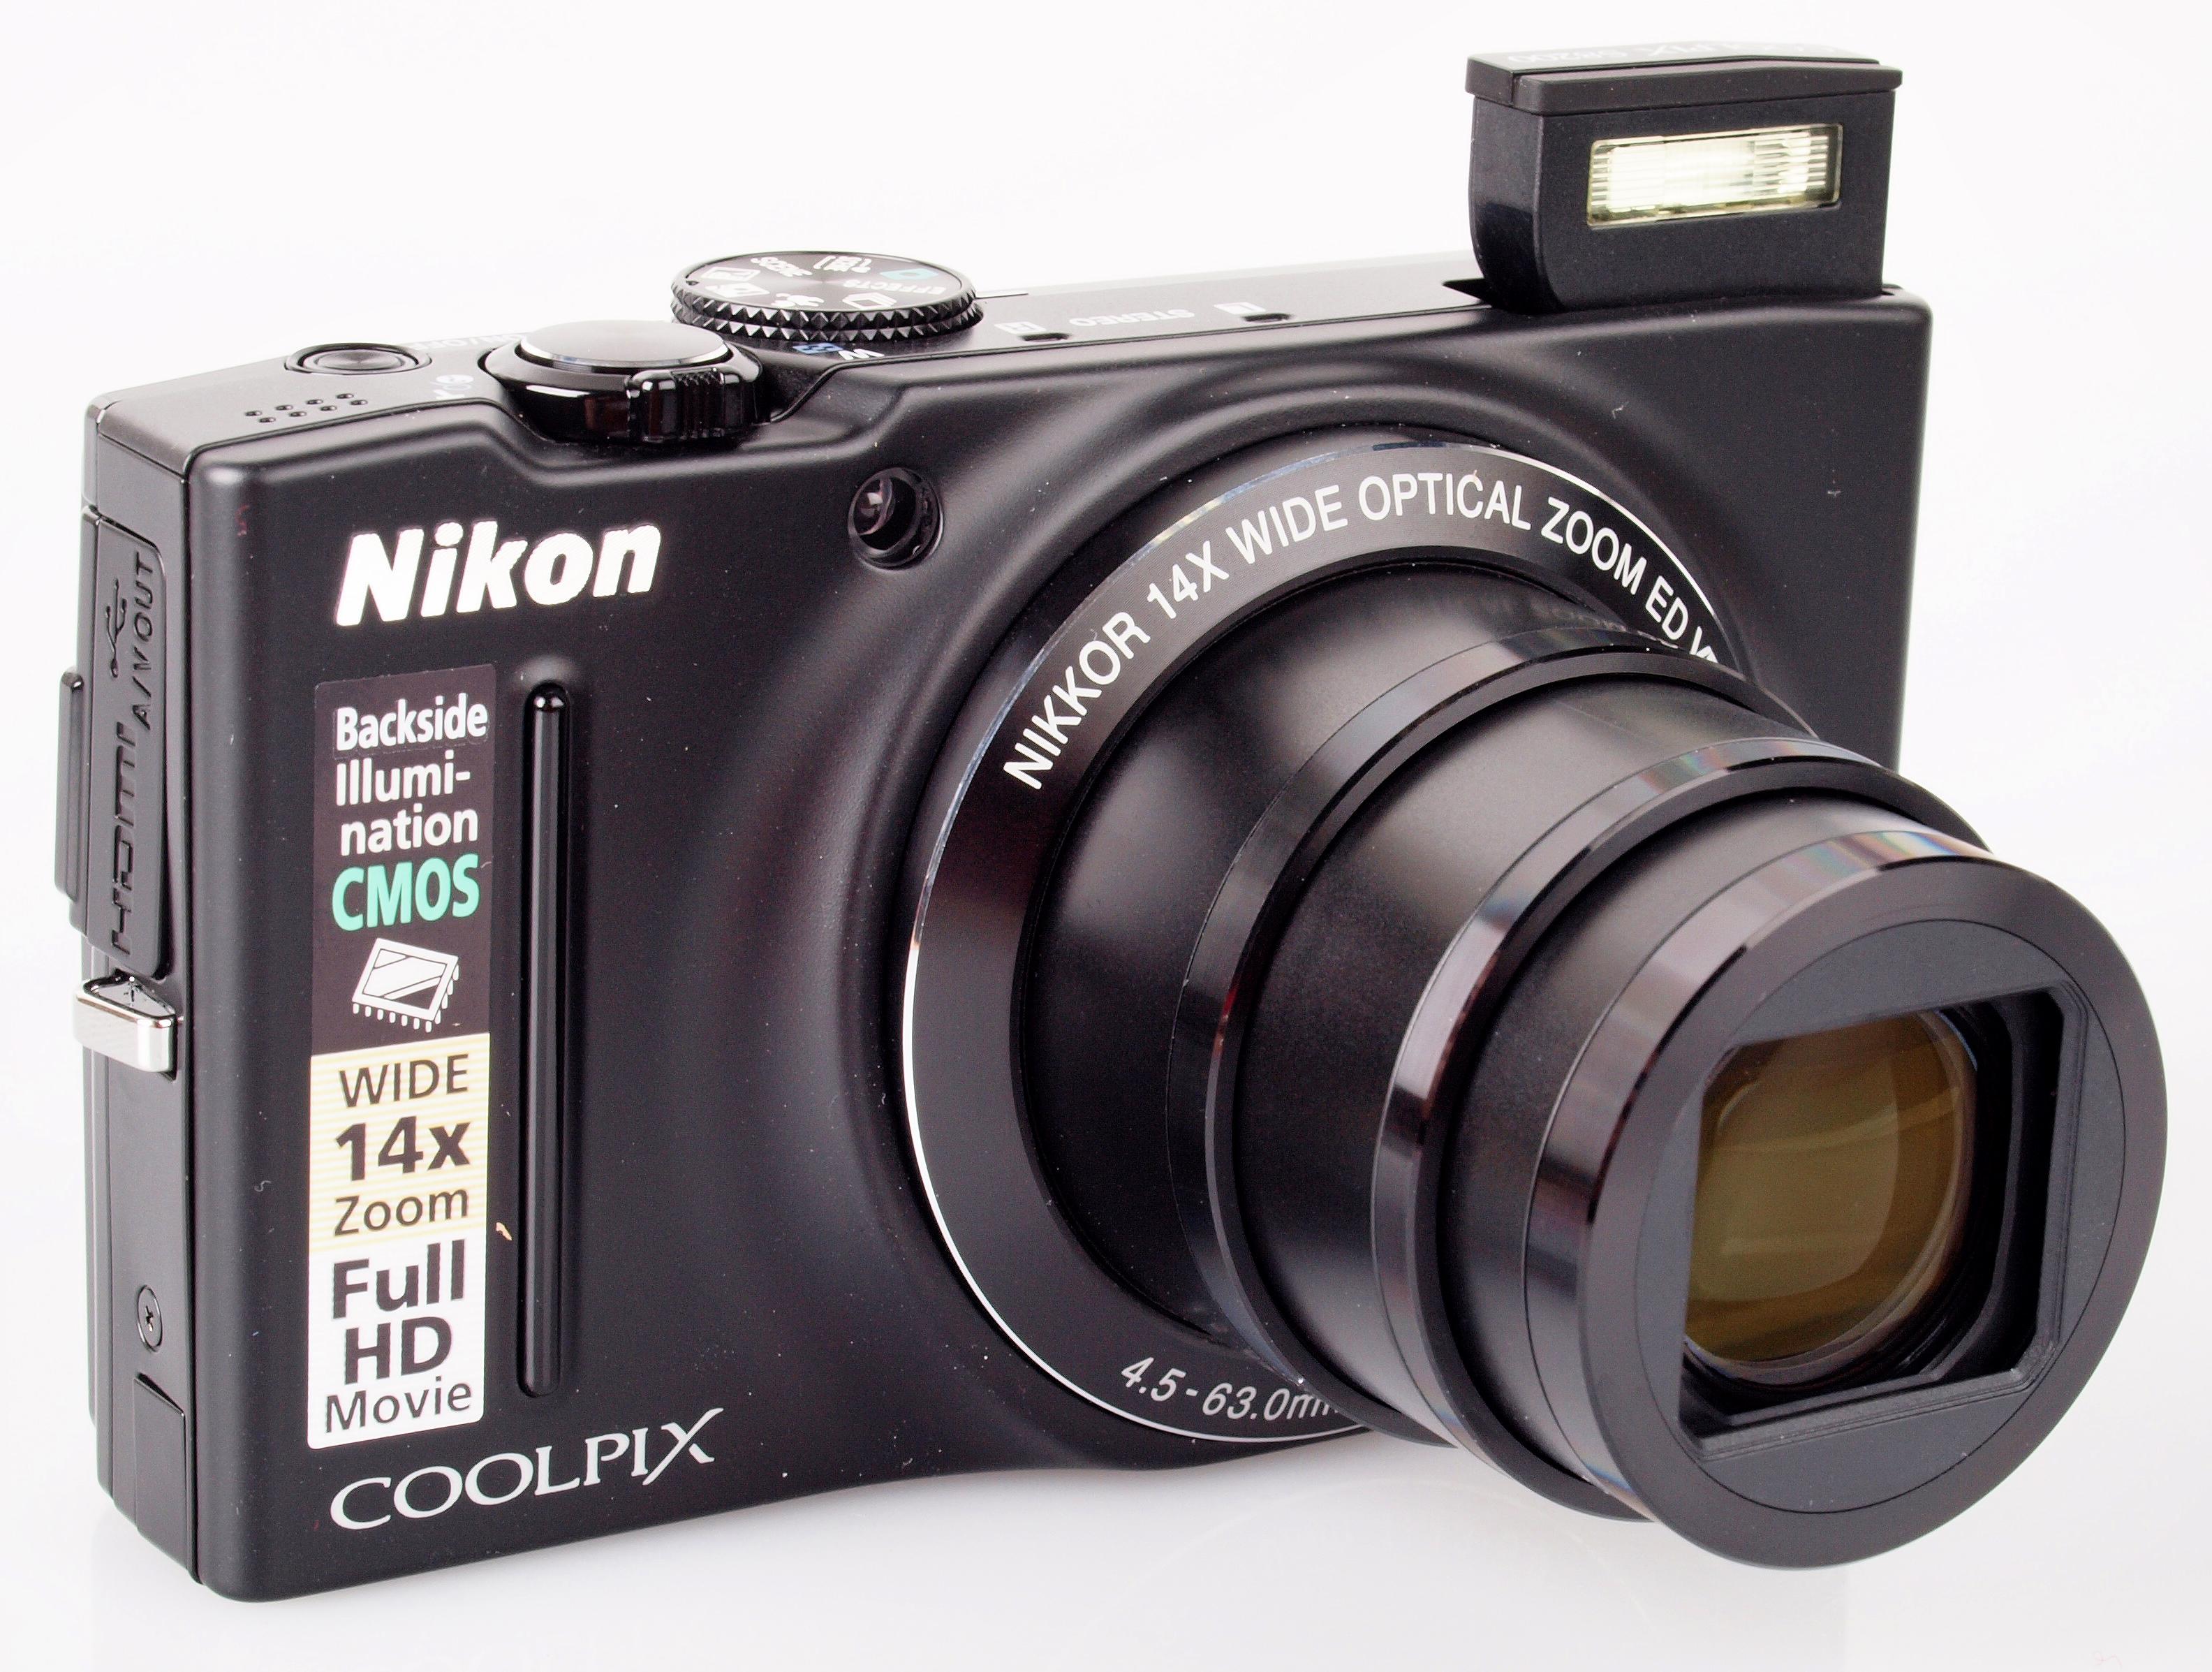 Nikon Coolpix S8200 Digital Compact Camera Review